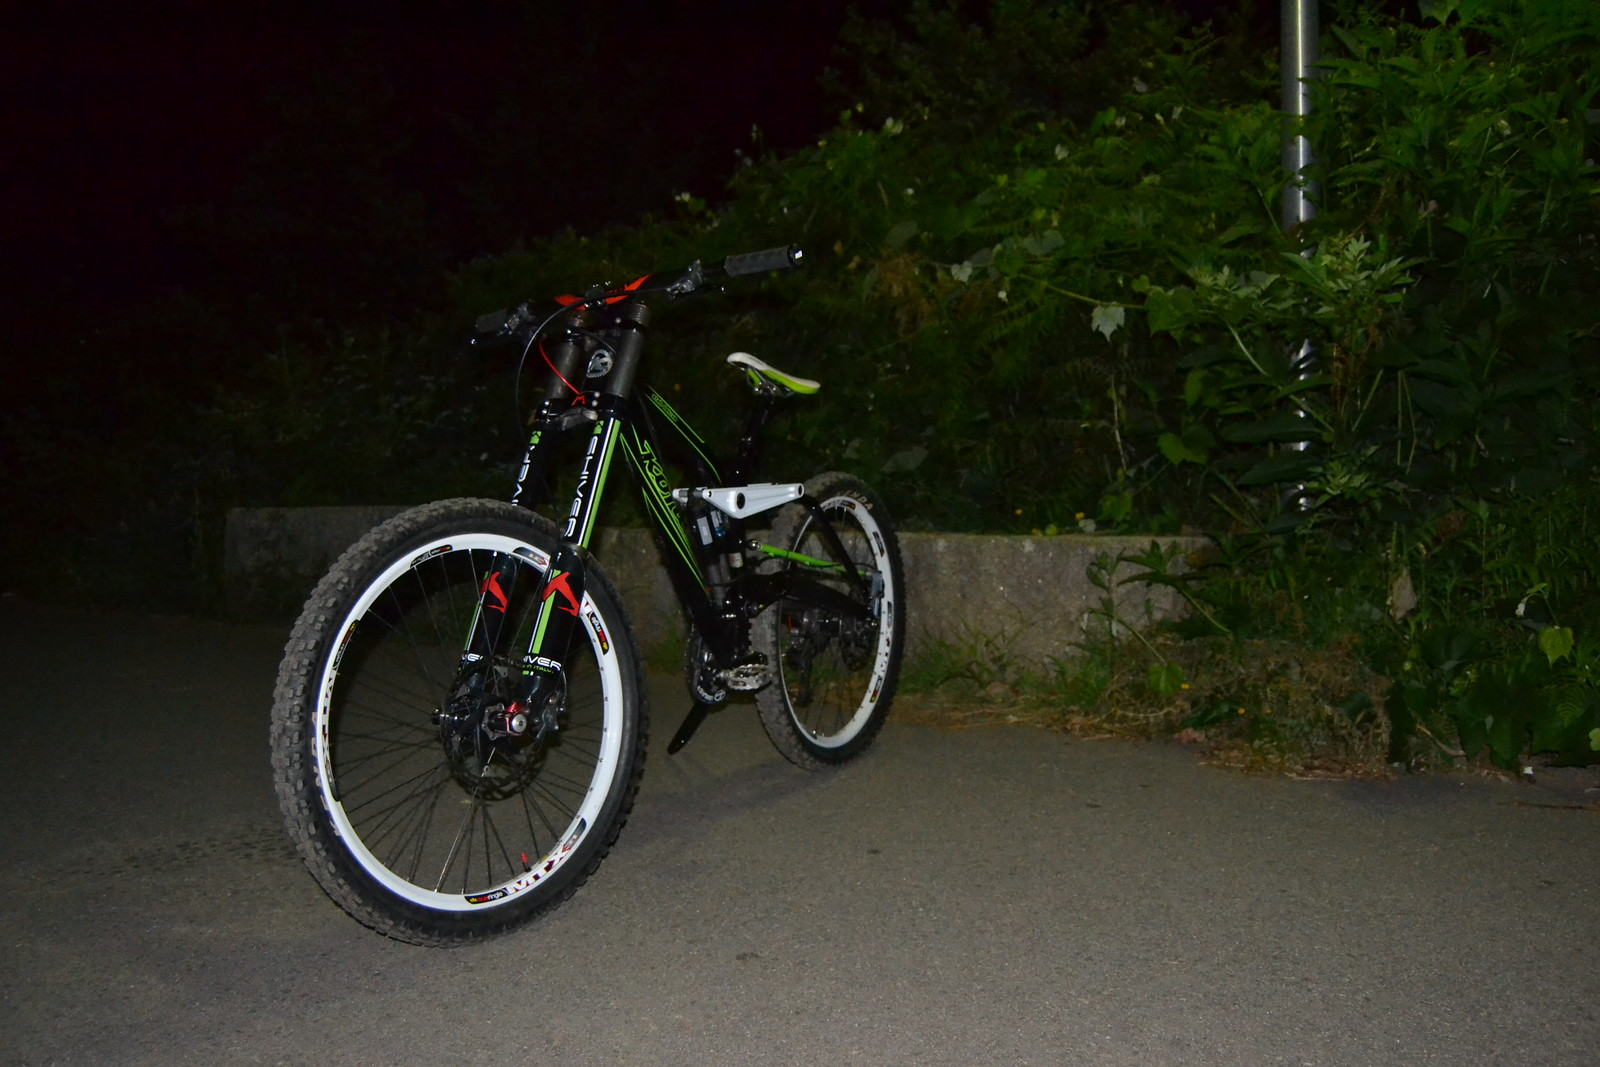 Kona Stab 2010 - sadfusde - Mountain Biking Pictures - Vital MTB